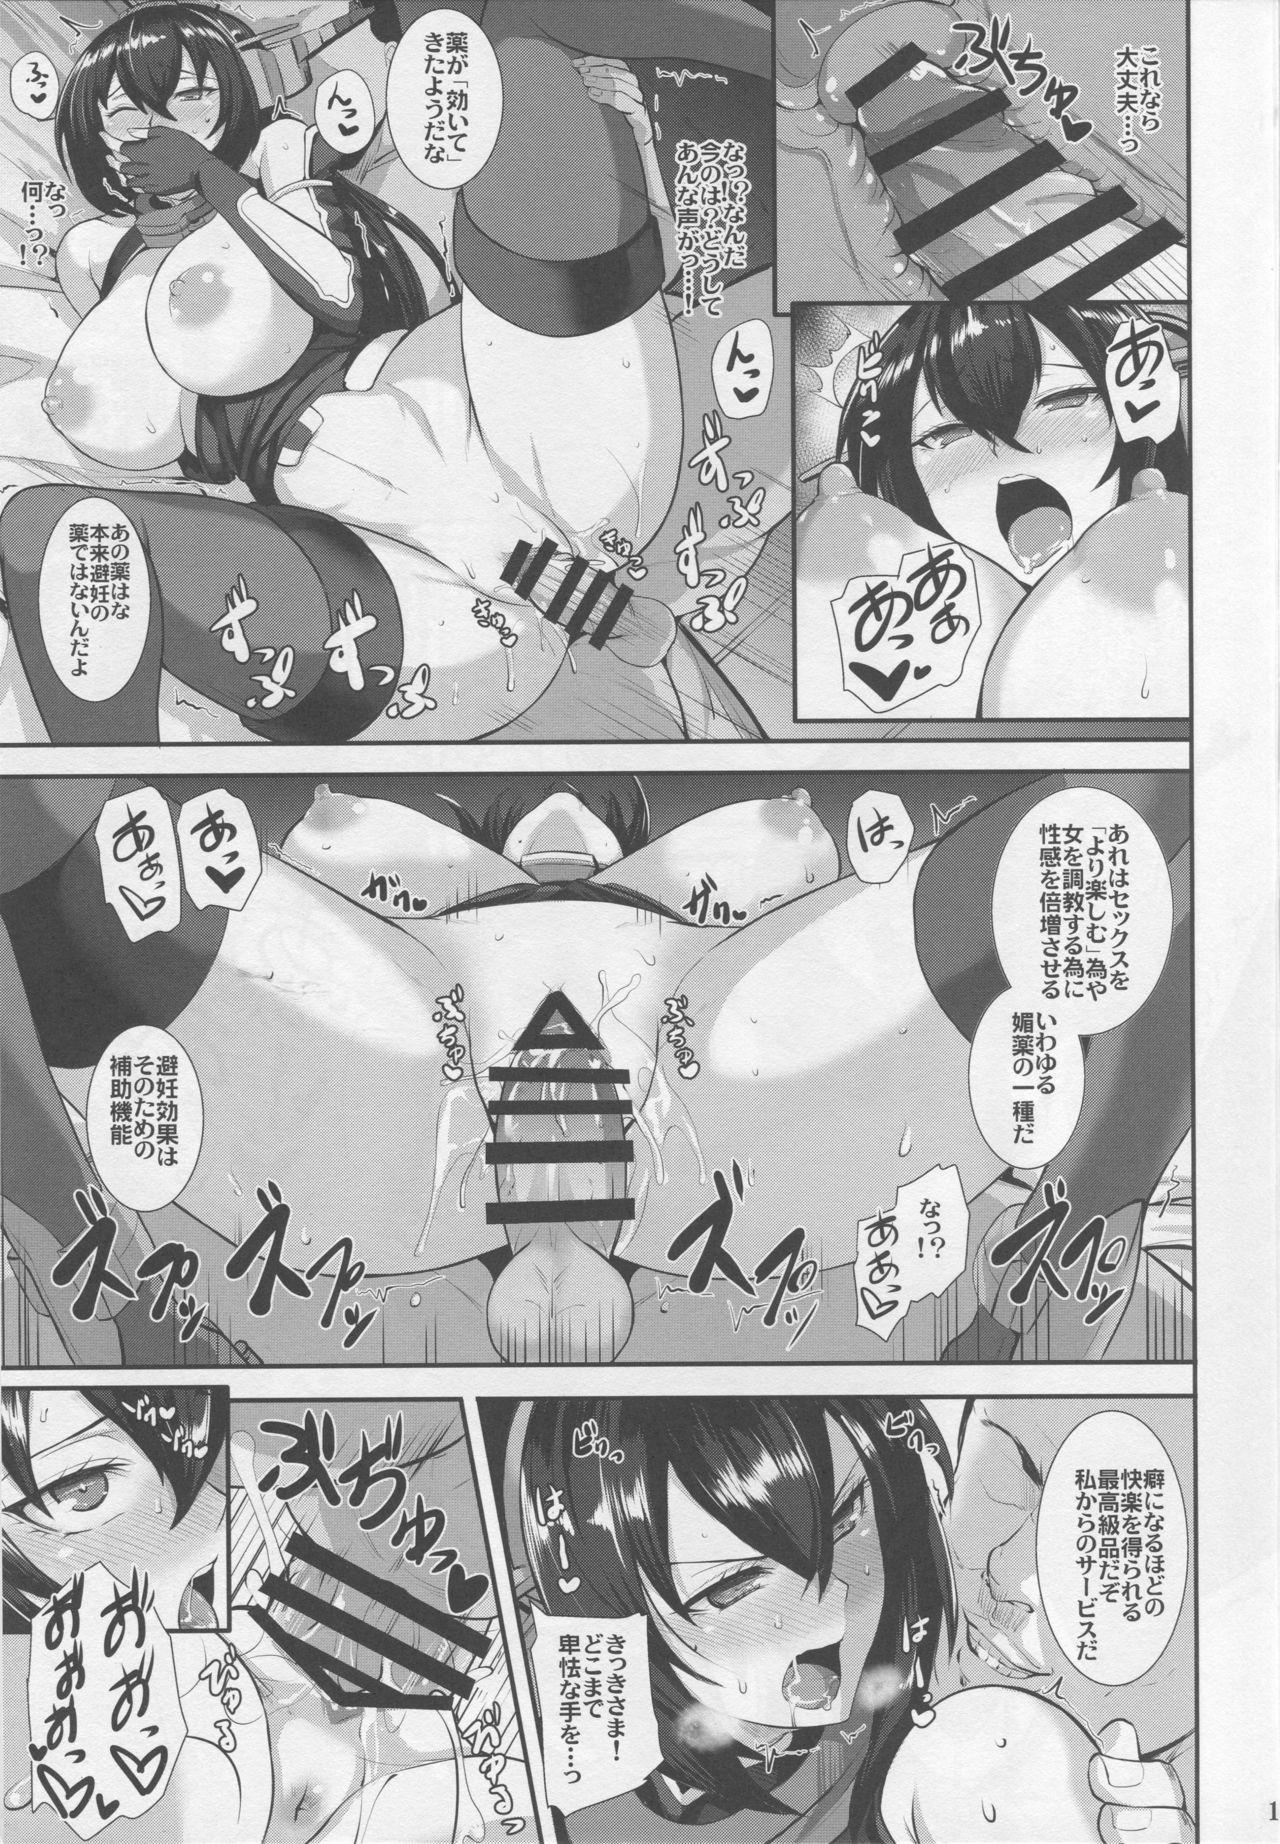 Ochiyuku Shimaikan 11